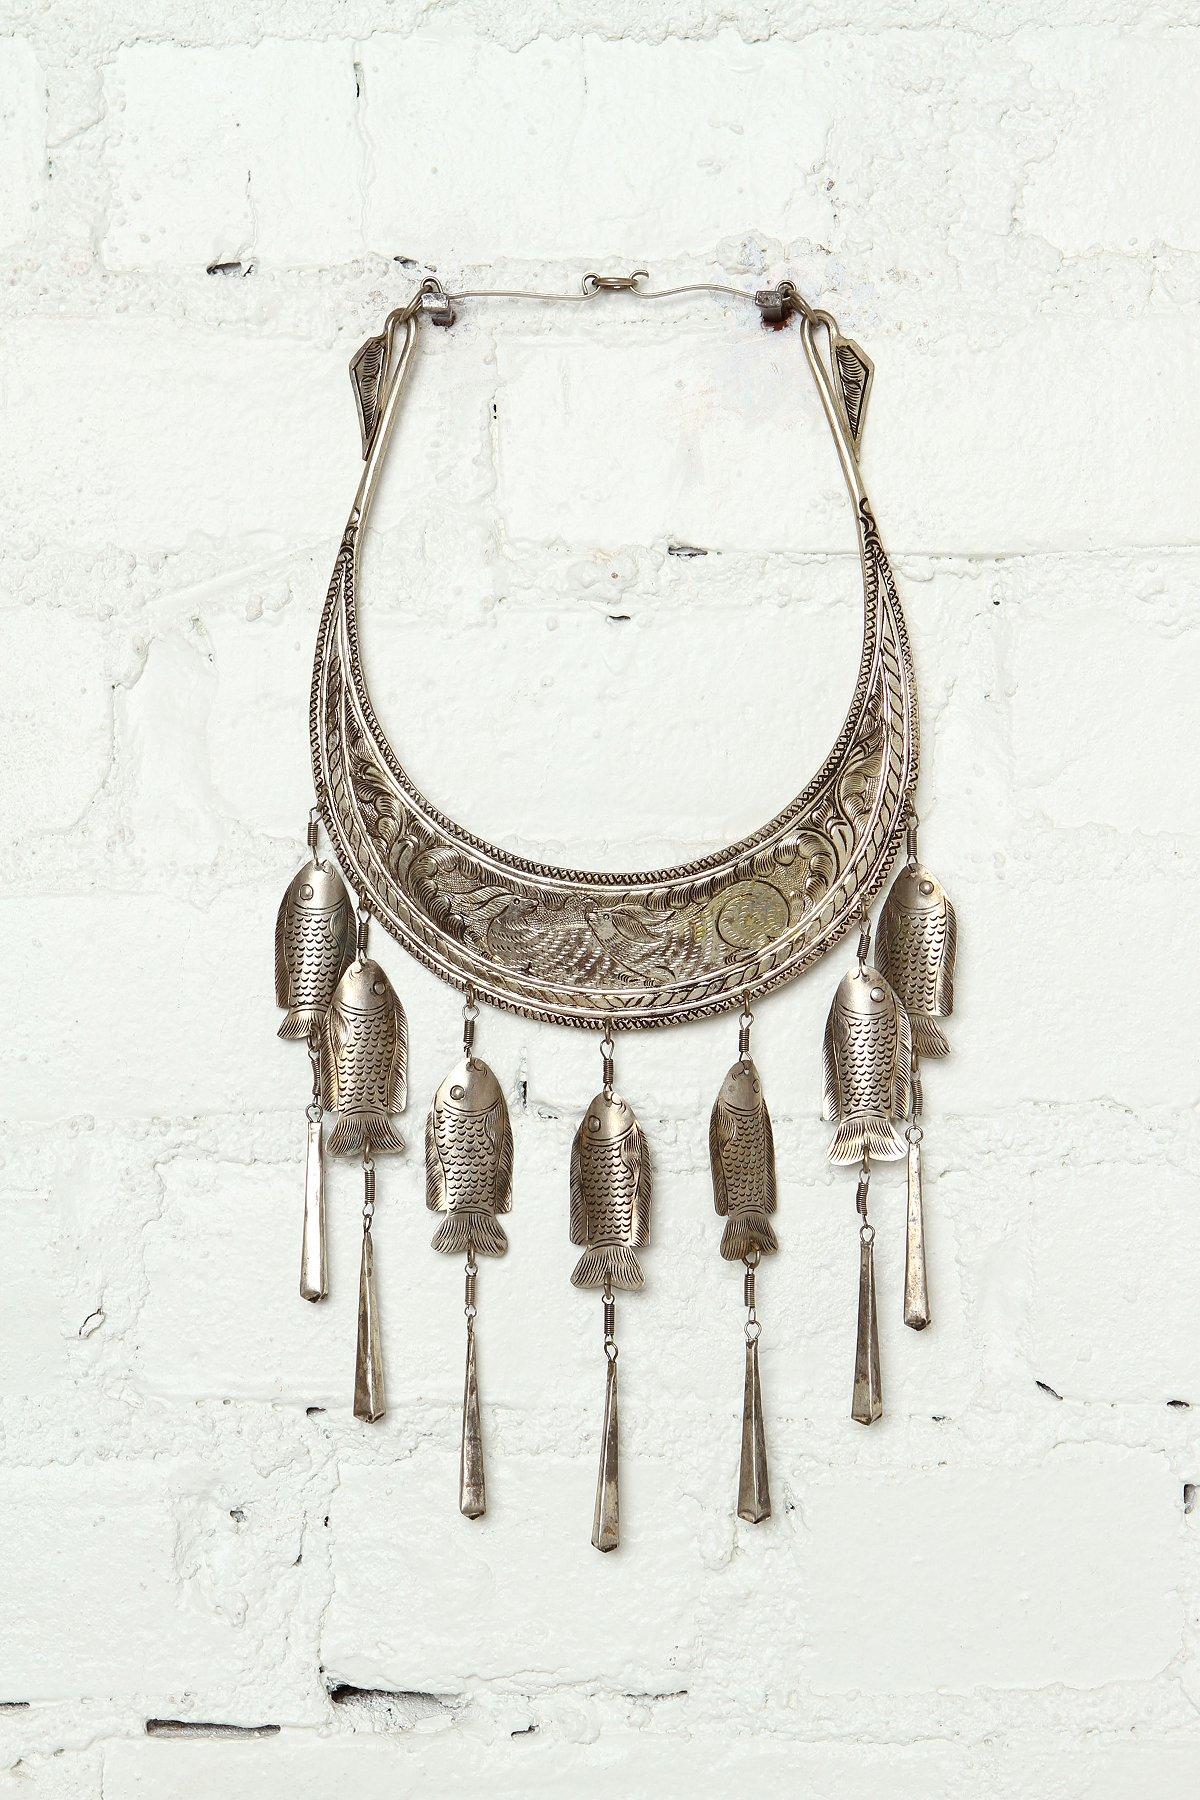 Vintage Etched Metal Collar Necklace